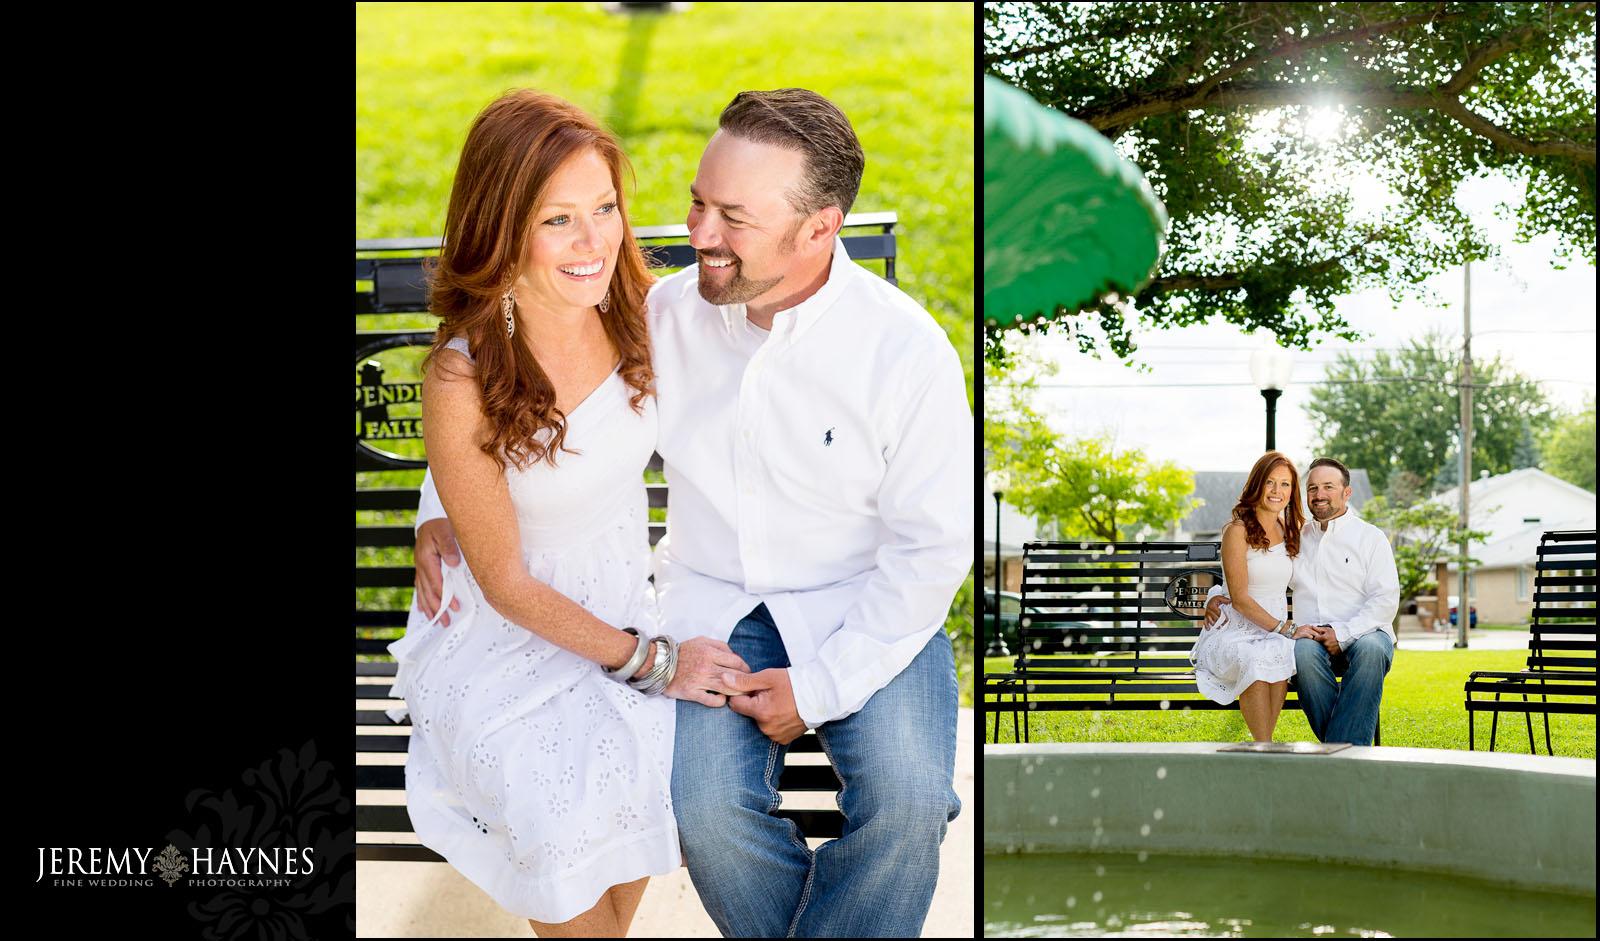 Jason + Morgan Falls Park Pendleton Engagement 1.jpg